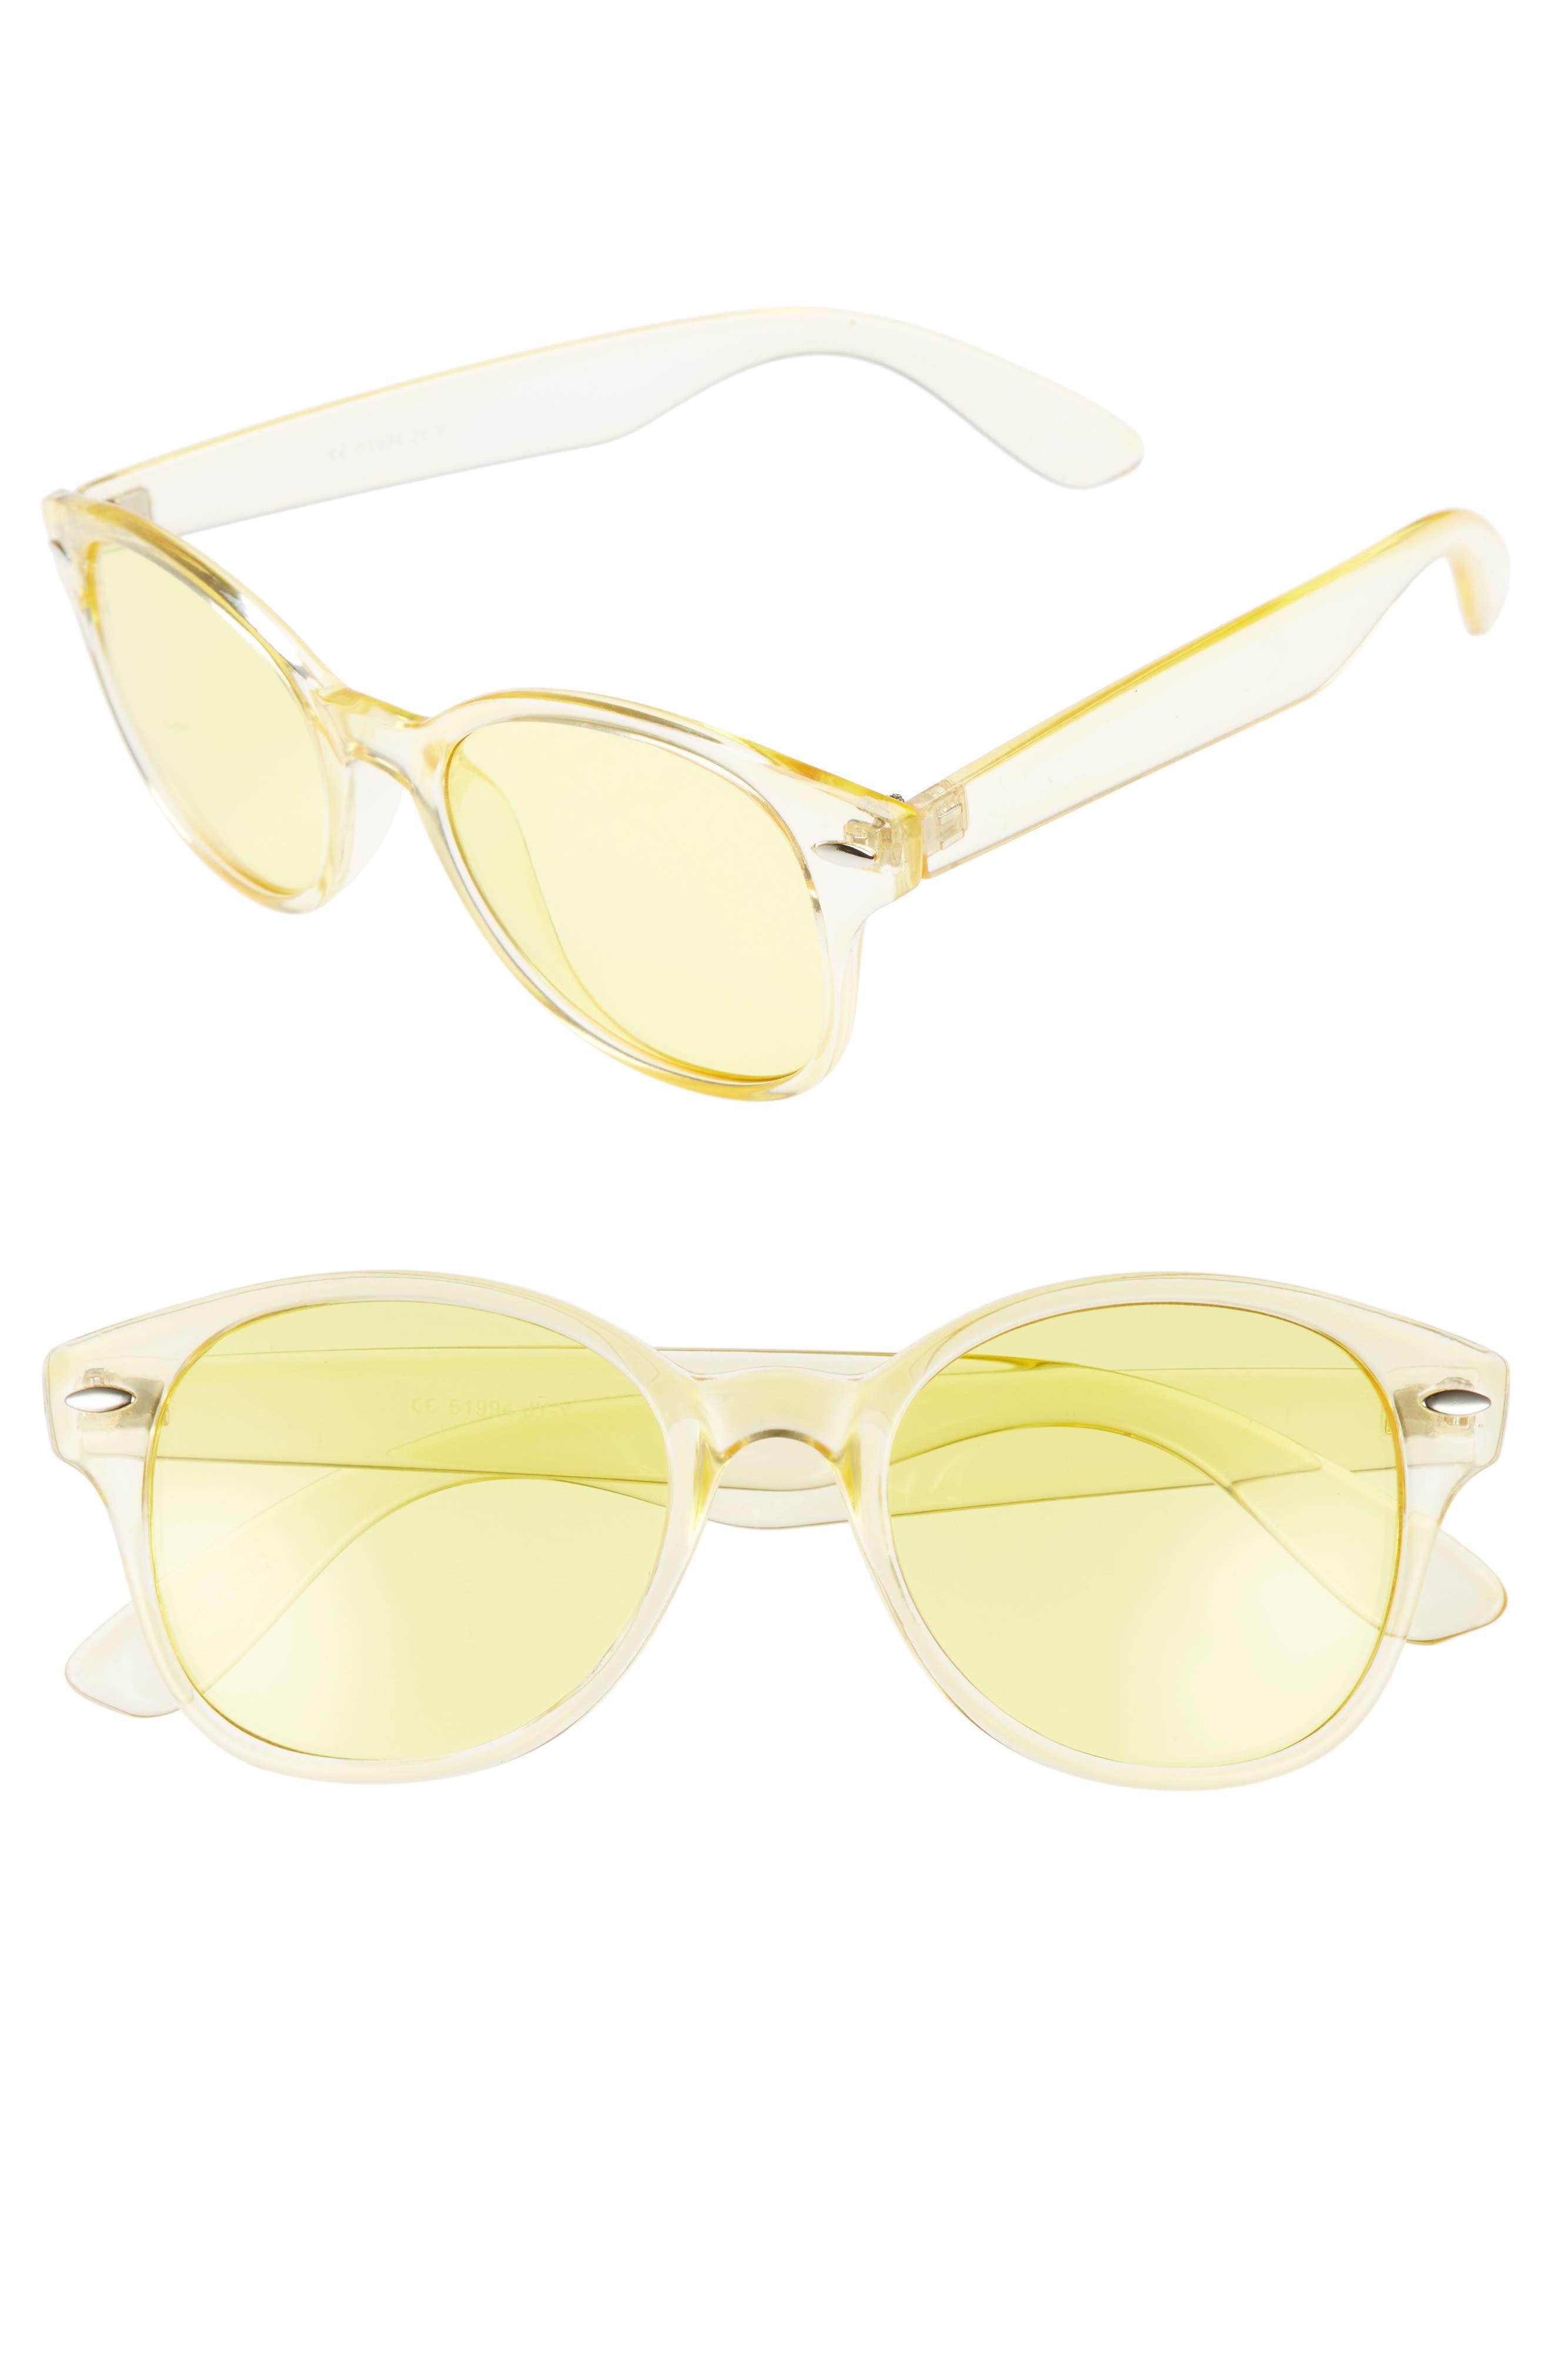 50mm Transparent Round Sunglasses,                         Main,                         color, Yellow